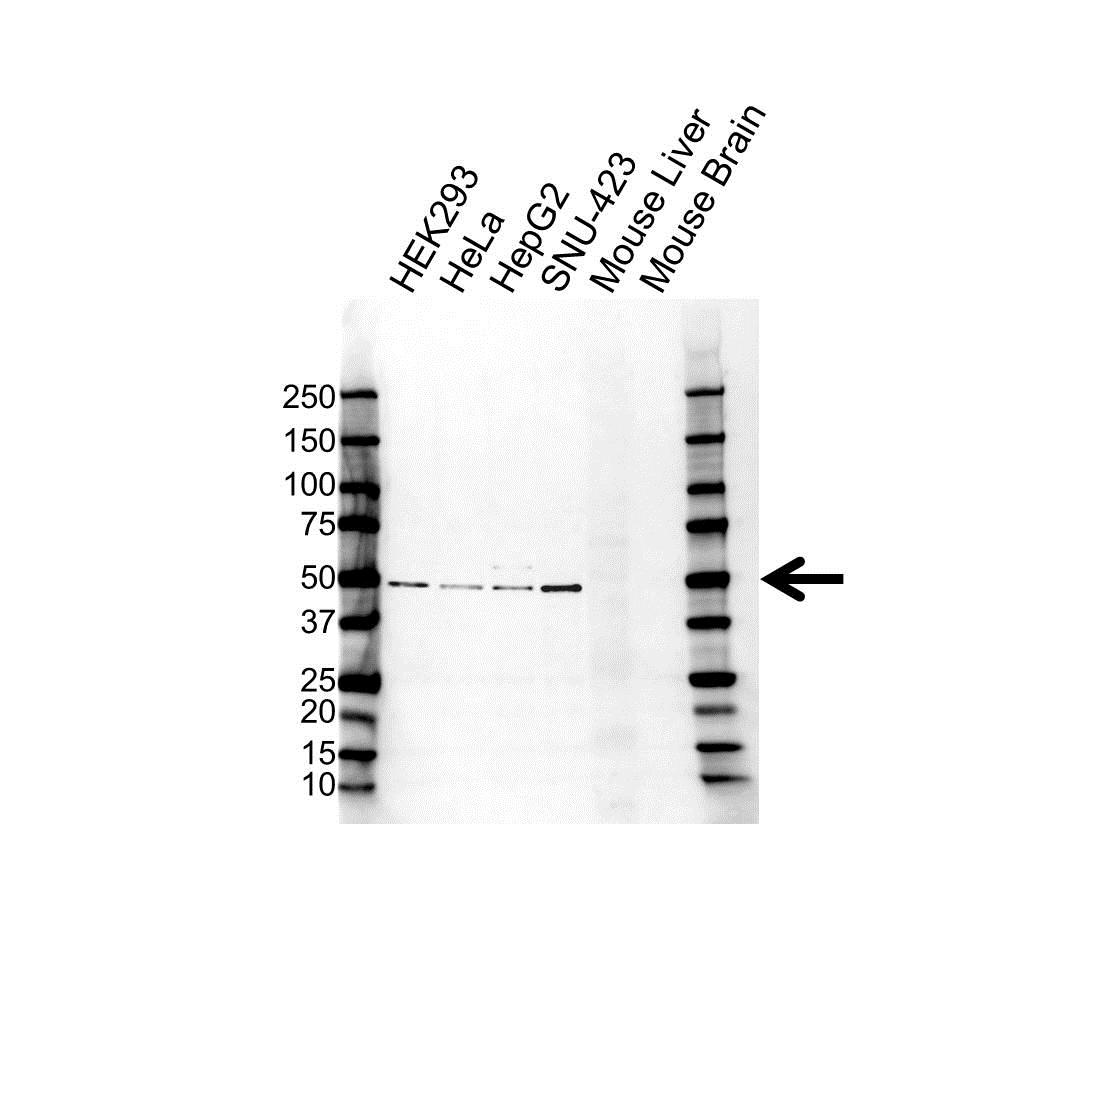 Anti Lymphotoxin Beta Receptor Antibody (PrecisionAb Polyclonal Antibody) gallery image 1